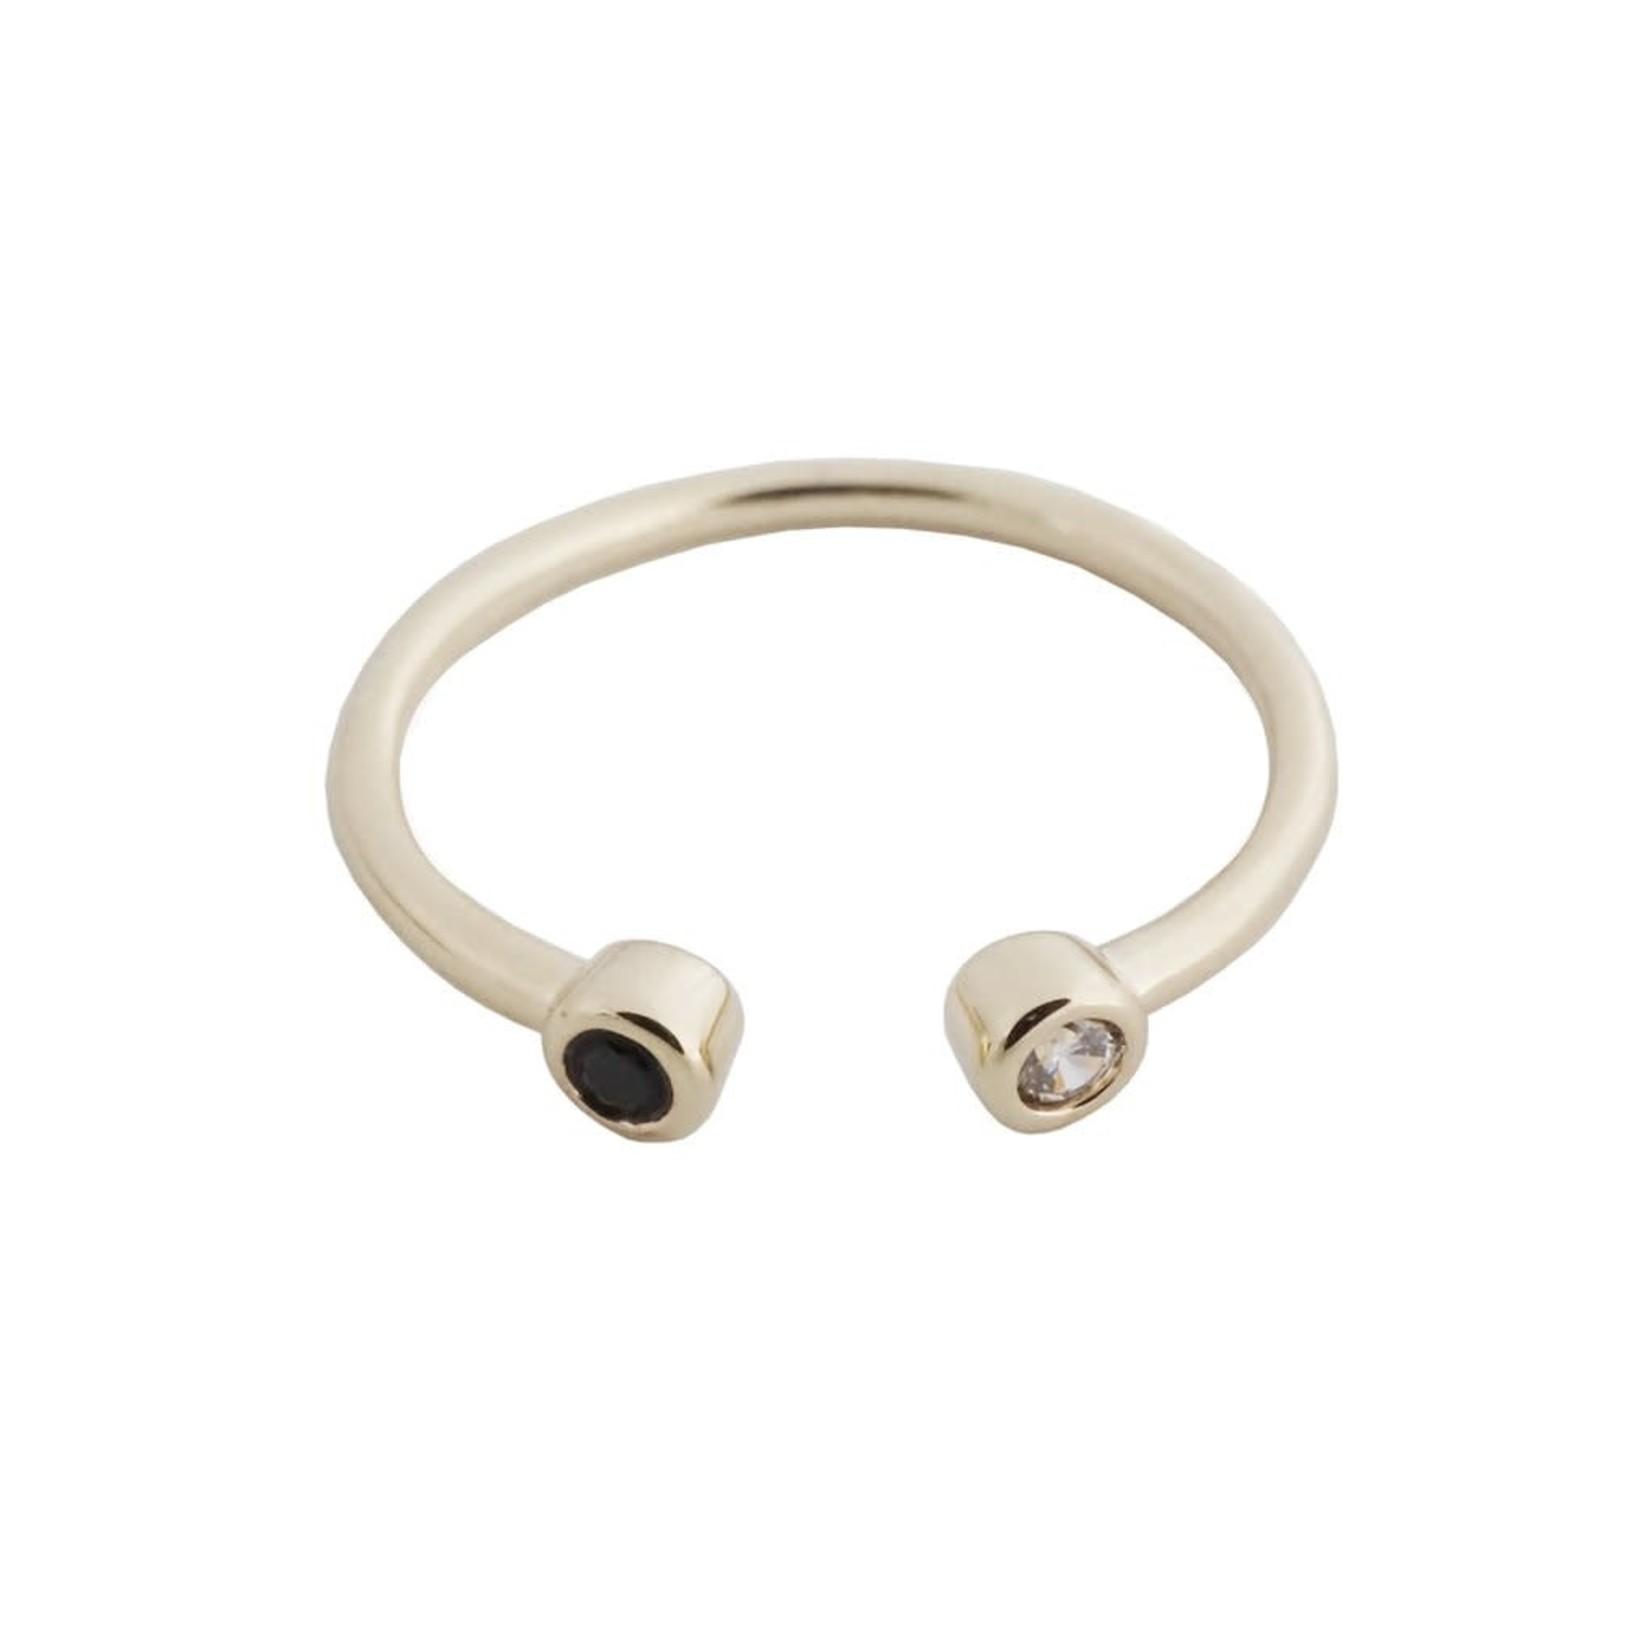 Honeycat Jewelry Honeycat JJ Bestie Ring